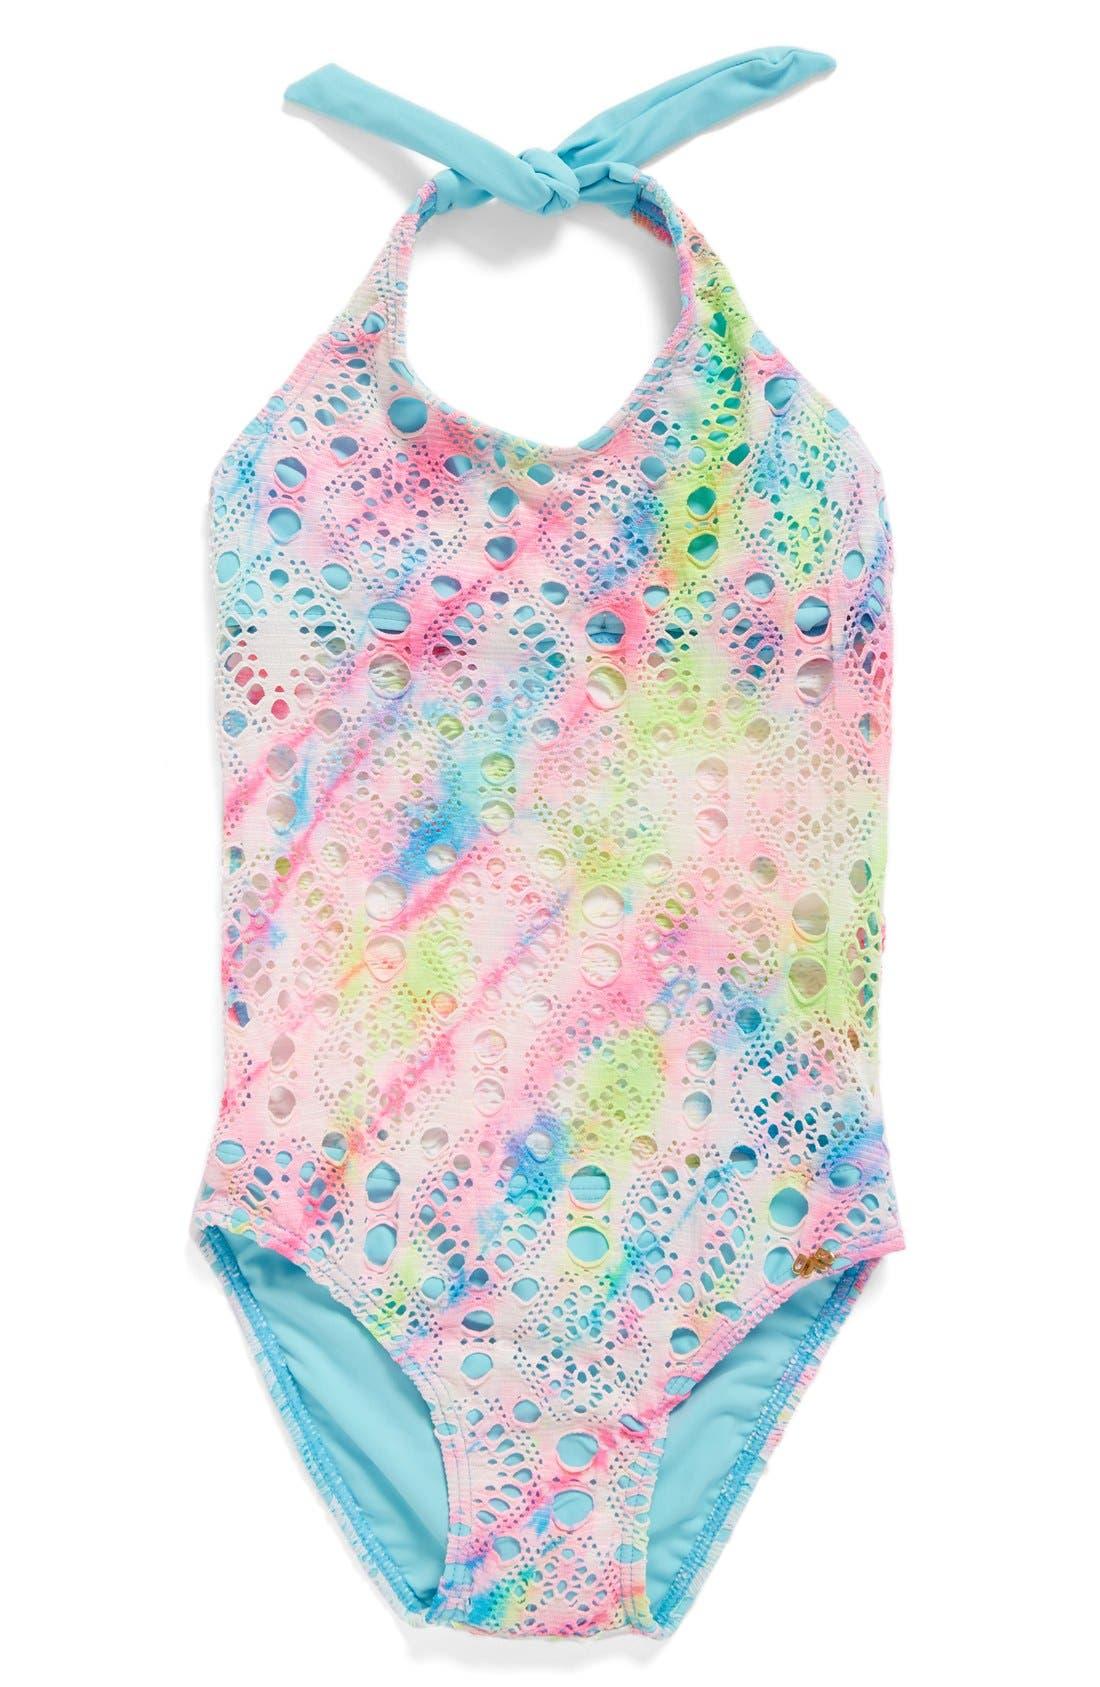 PILYQ One-Piece Swimsuit